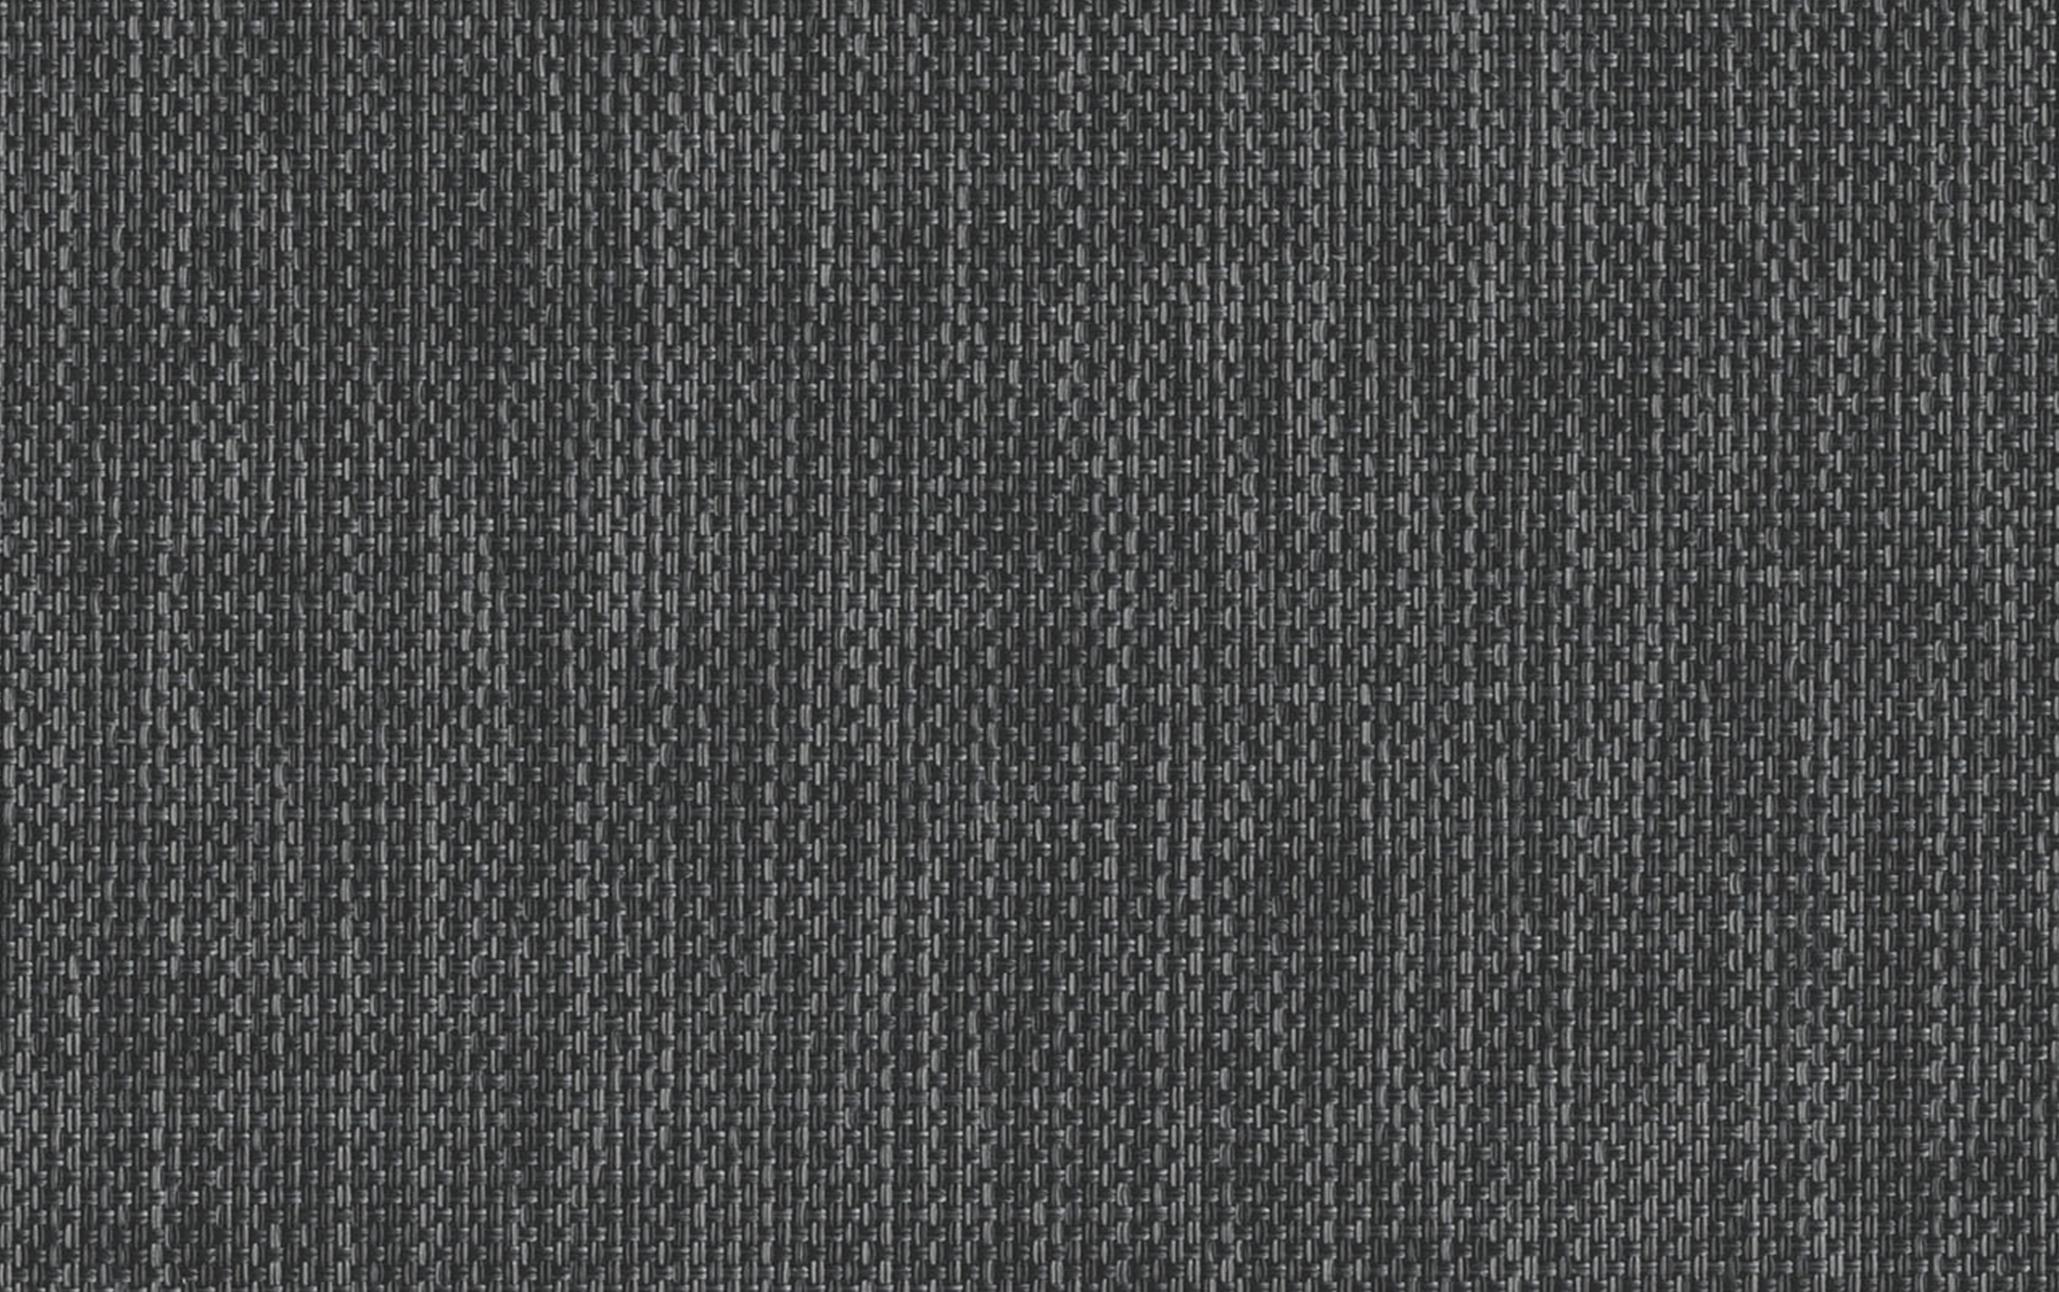 Grey Tabby - 1903